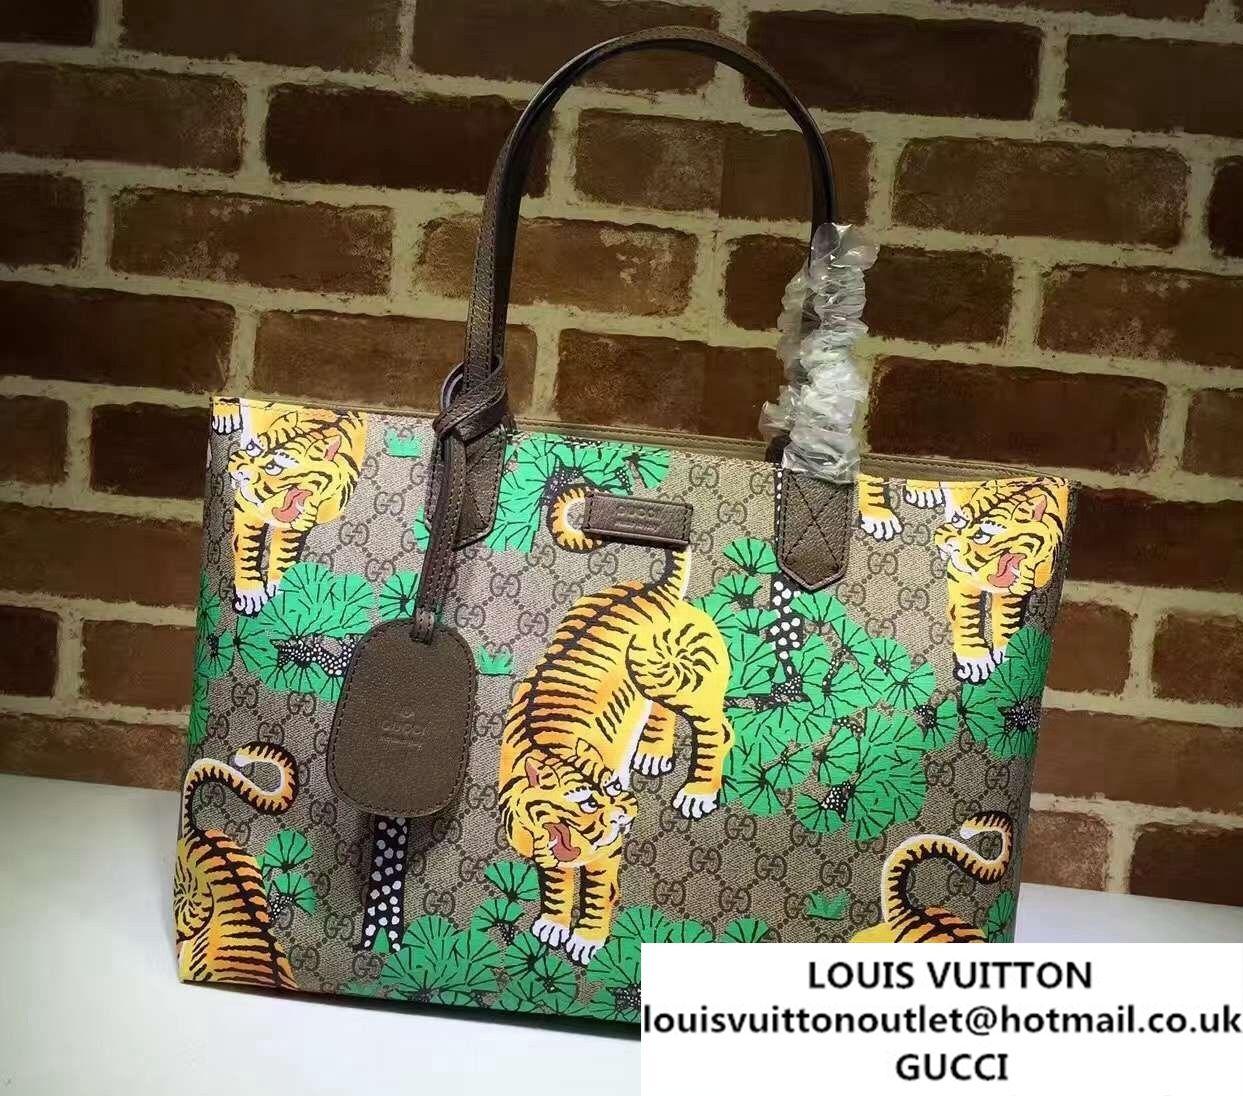 5a4bcc87a291 Gucci GG Supreme Web Medium Tote Bag 429002 Bengal Green 2016 ...